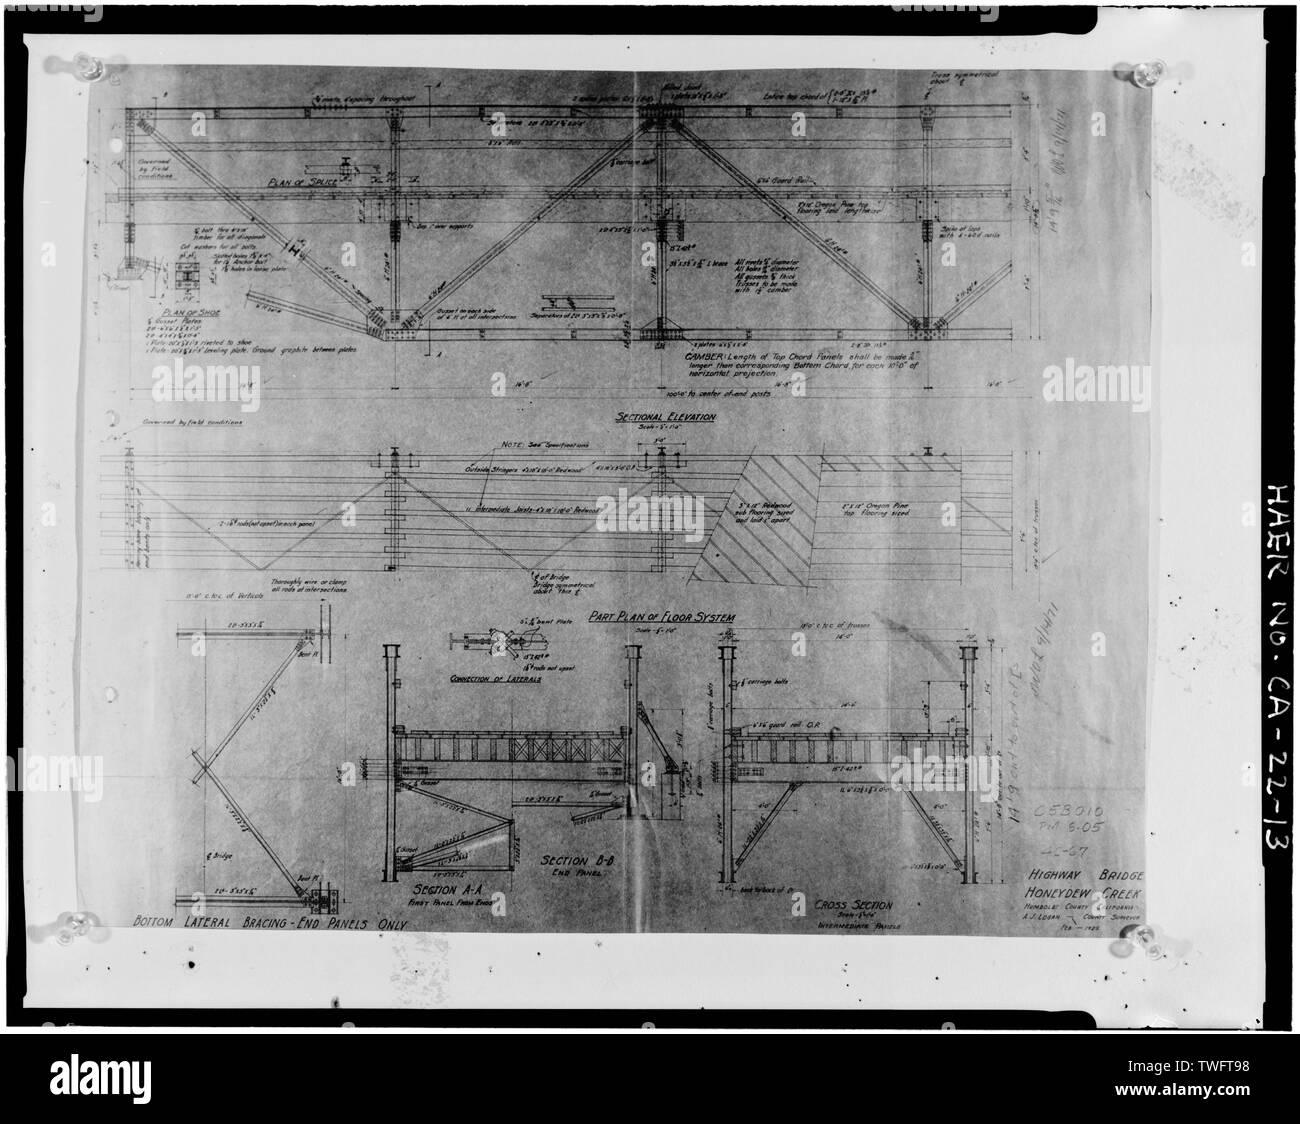 PROFILE AND PLAN, FEBRUARY 1925, HIGHWAY BRIDGE HONEYDEW CREEK, SHEET 2 - Honeydew Creek Bridge, Wilder Ridge Road, Honeydew, Humboldt County, CA - Stock Image